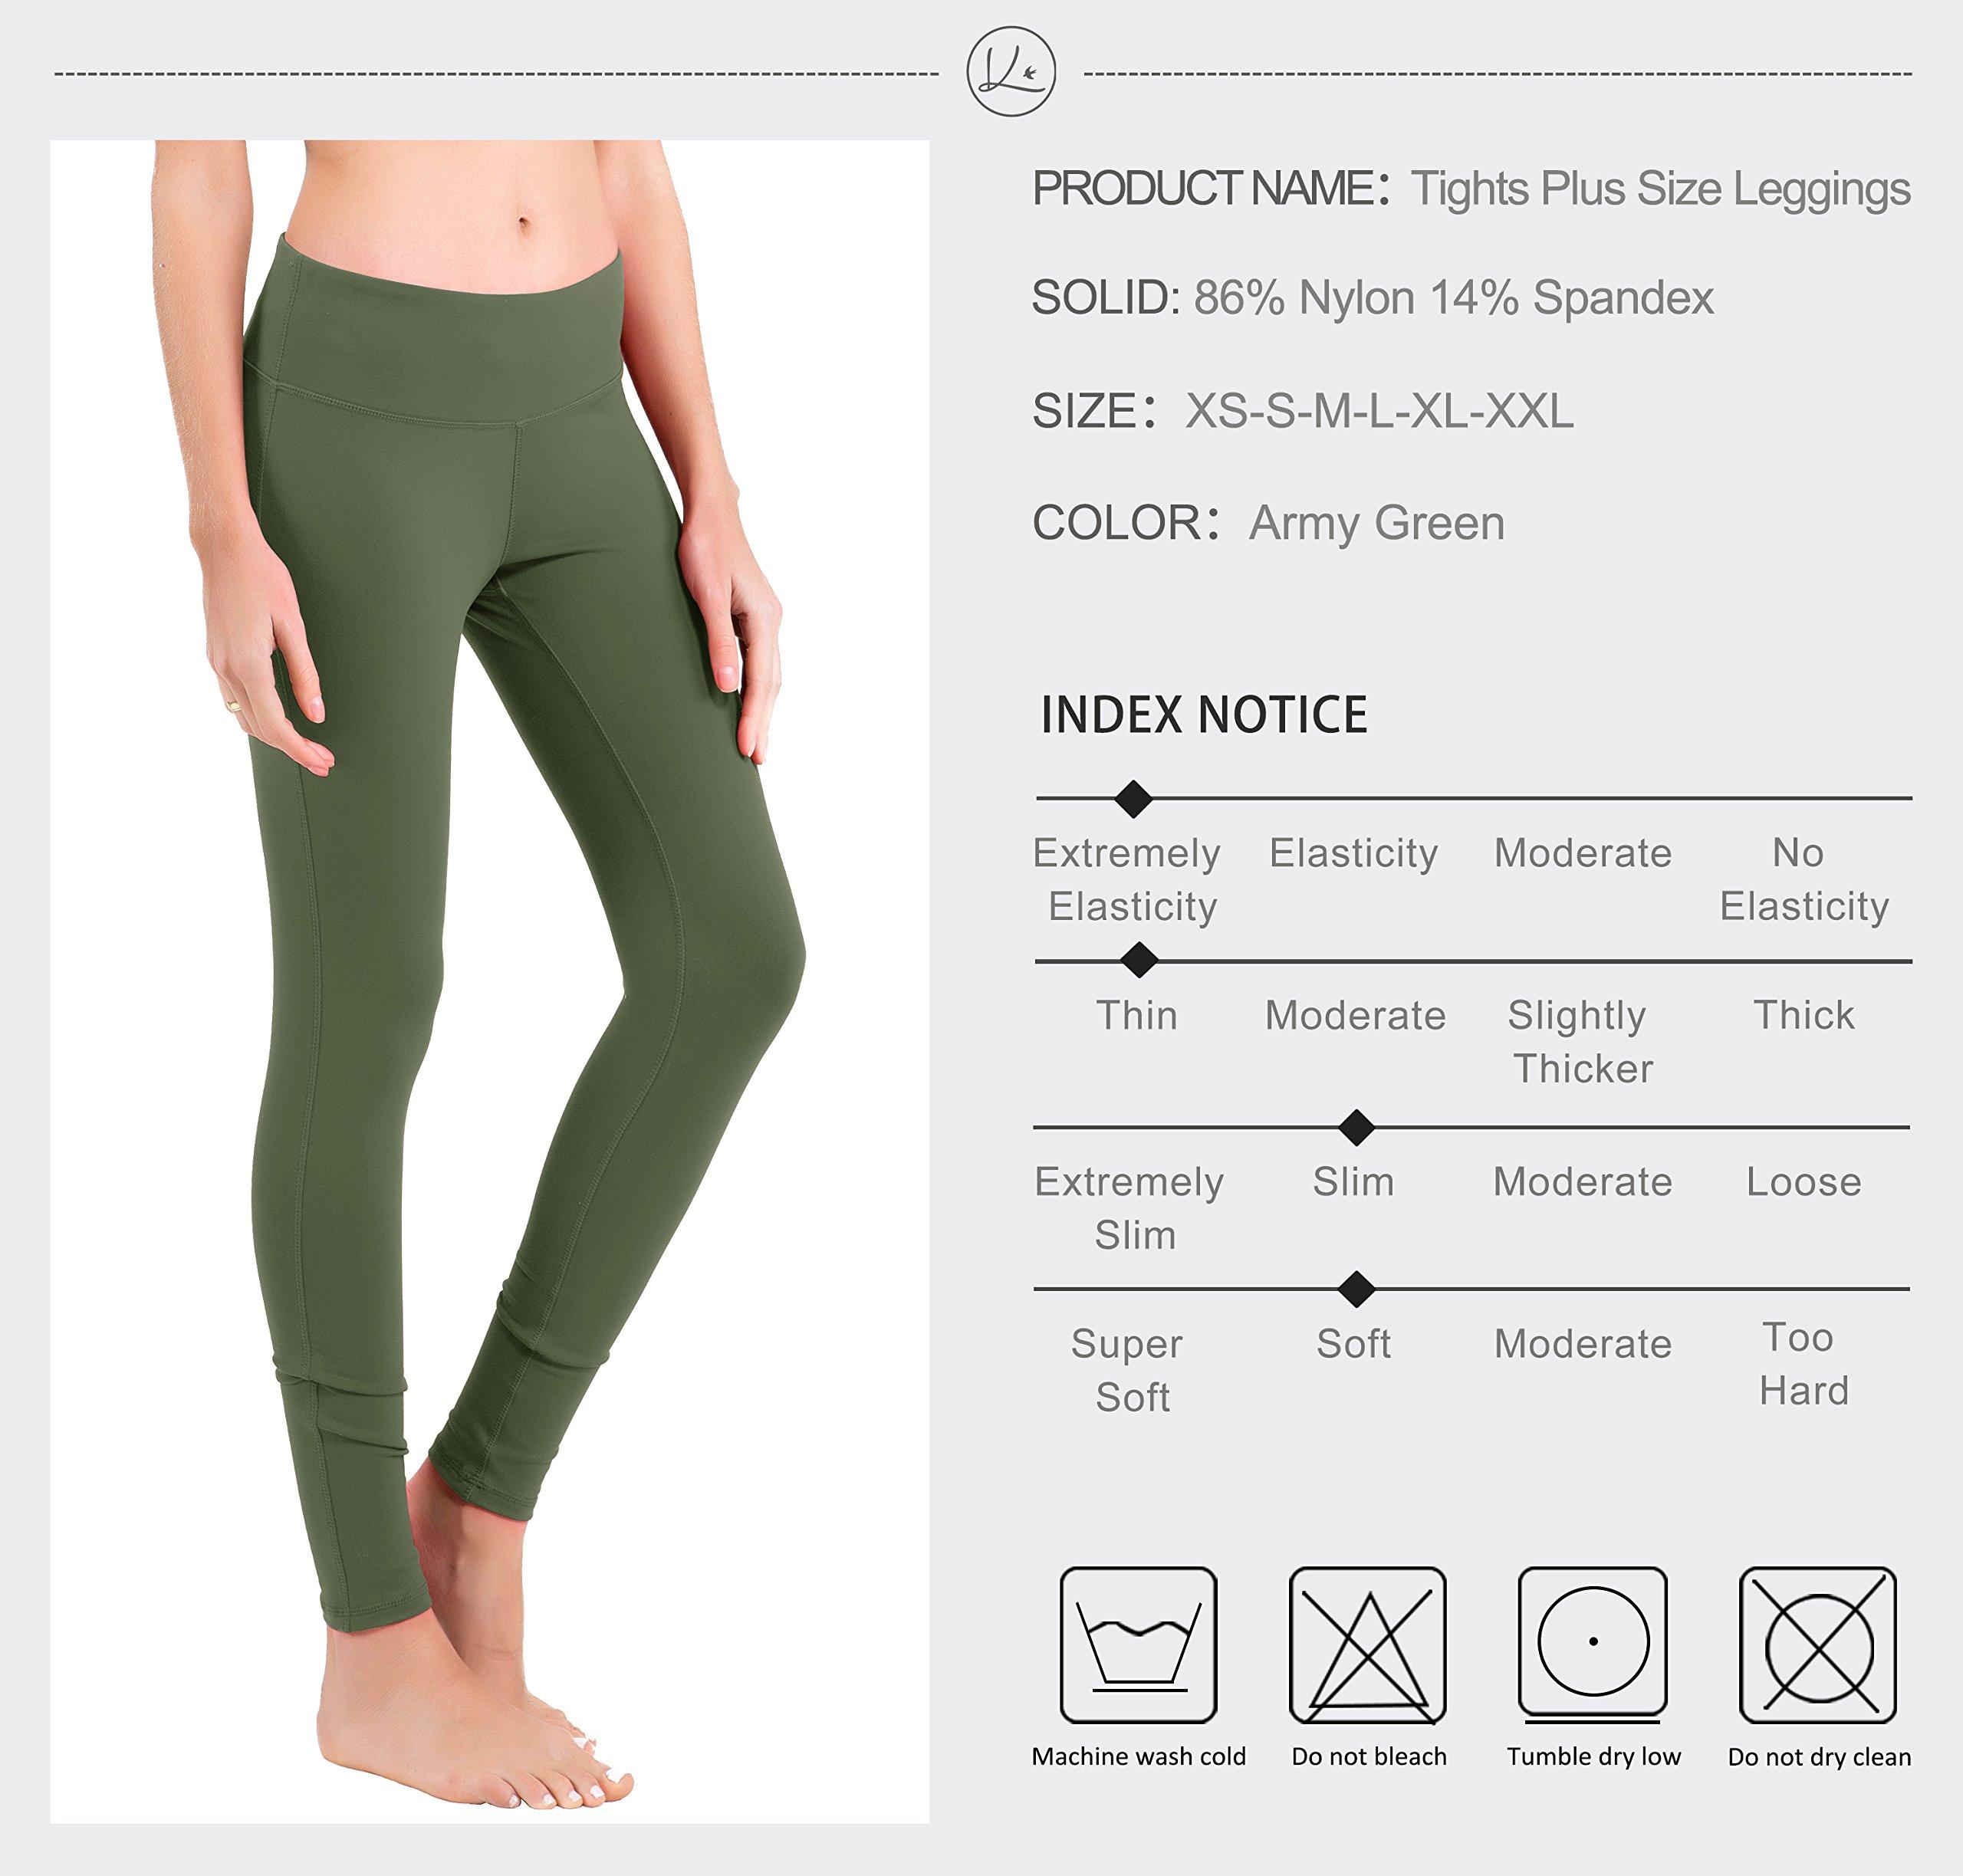 5be19bb846 Queenie Ke Women High Waist Hidden Pockets Sport Legging Yoga Pants Running  Tights Size M Color Army Green < Leggings < Sports & Outdoors - tibs